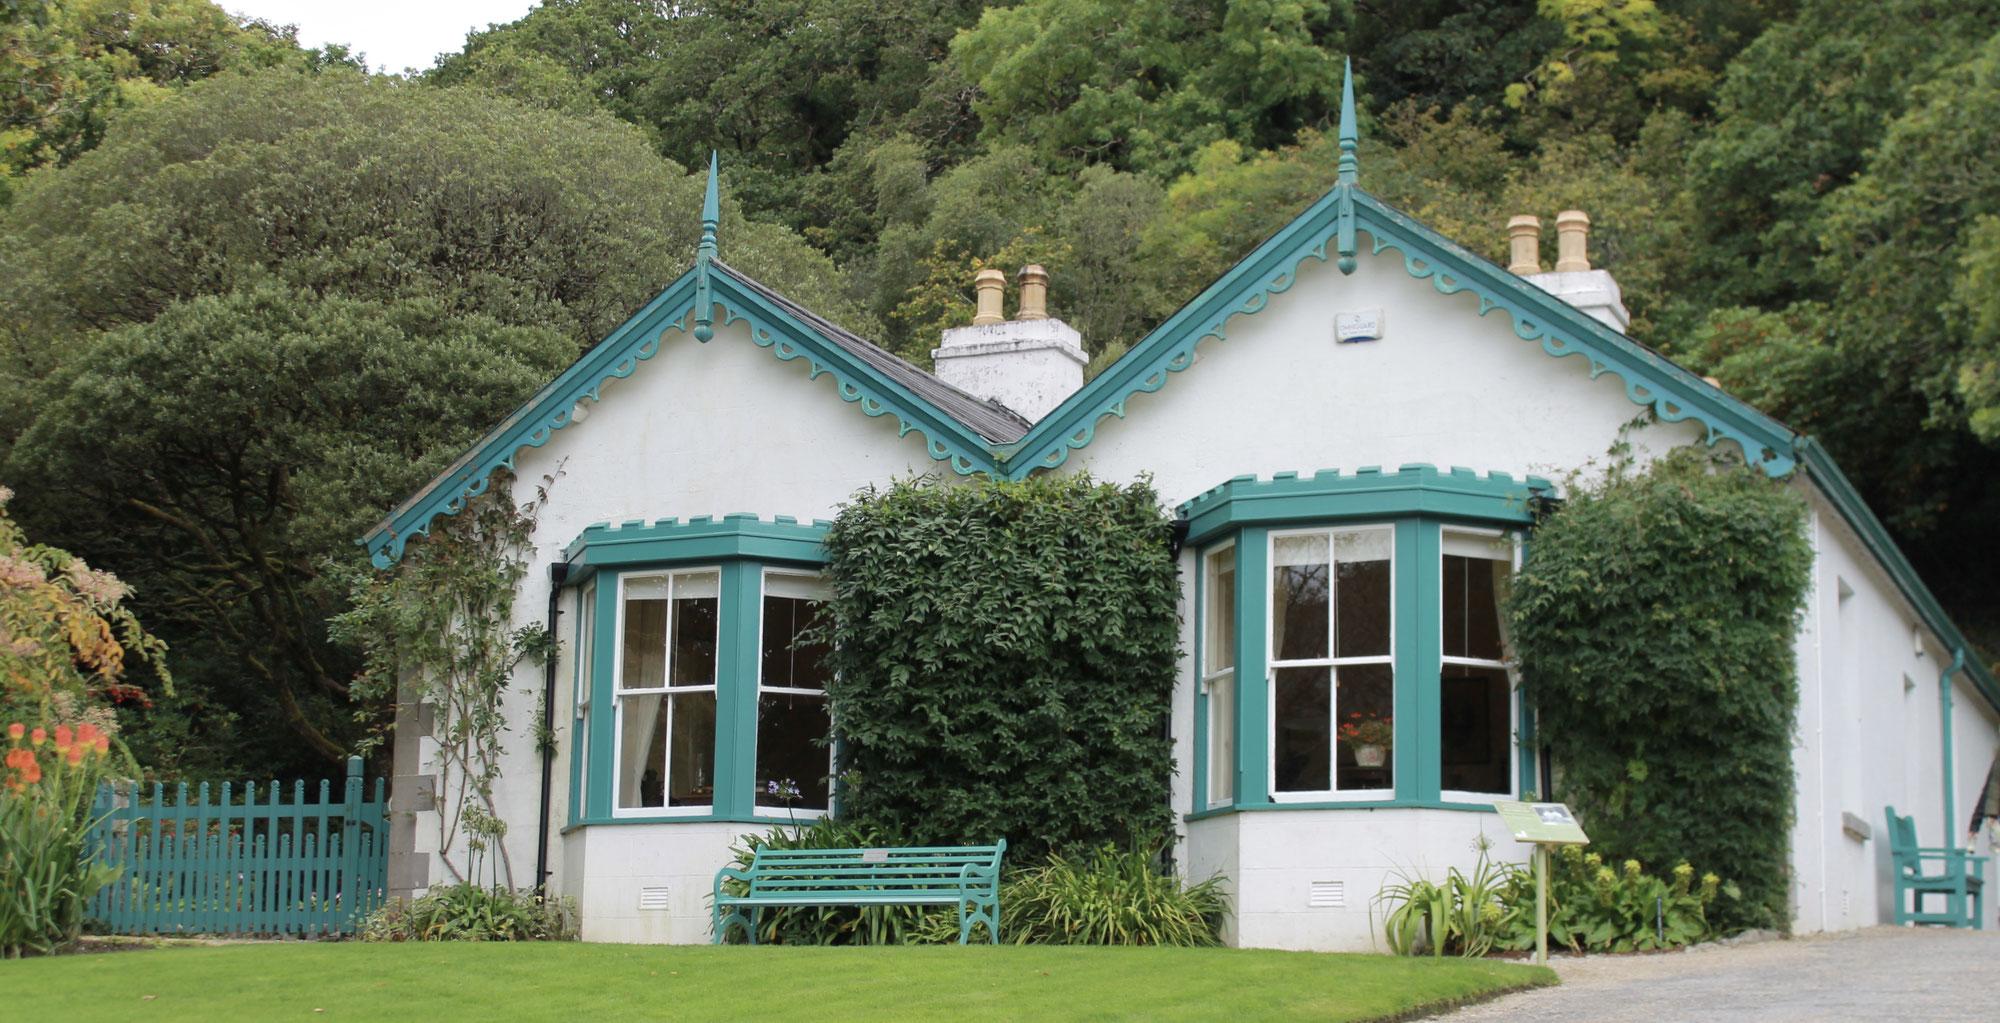 Horticultural History in Connemara